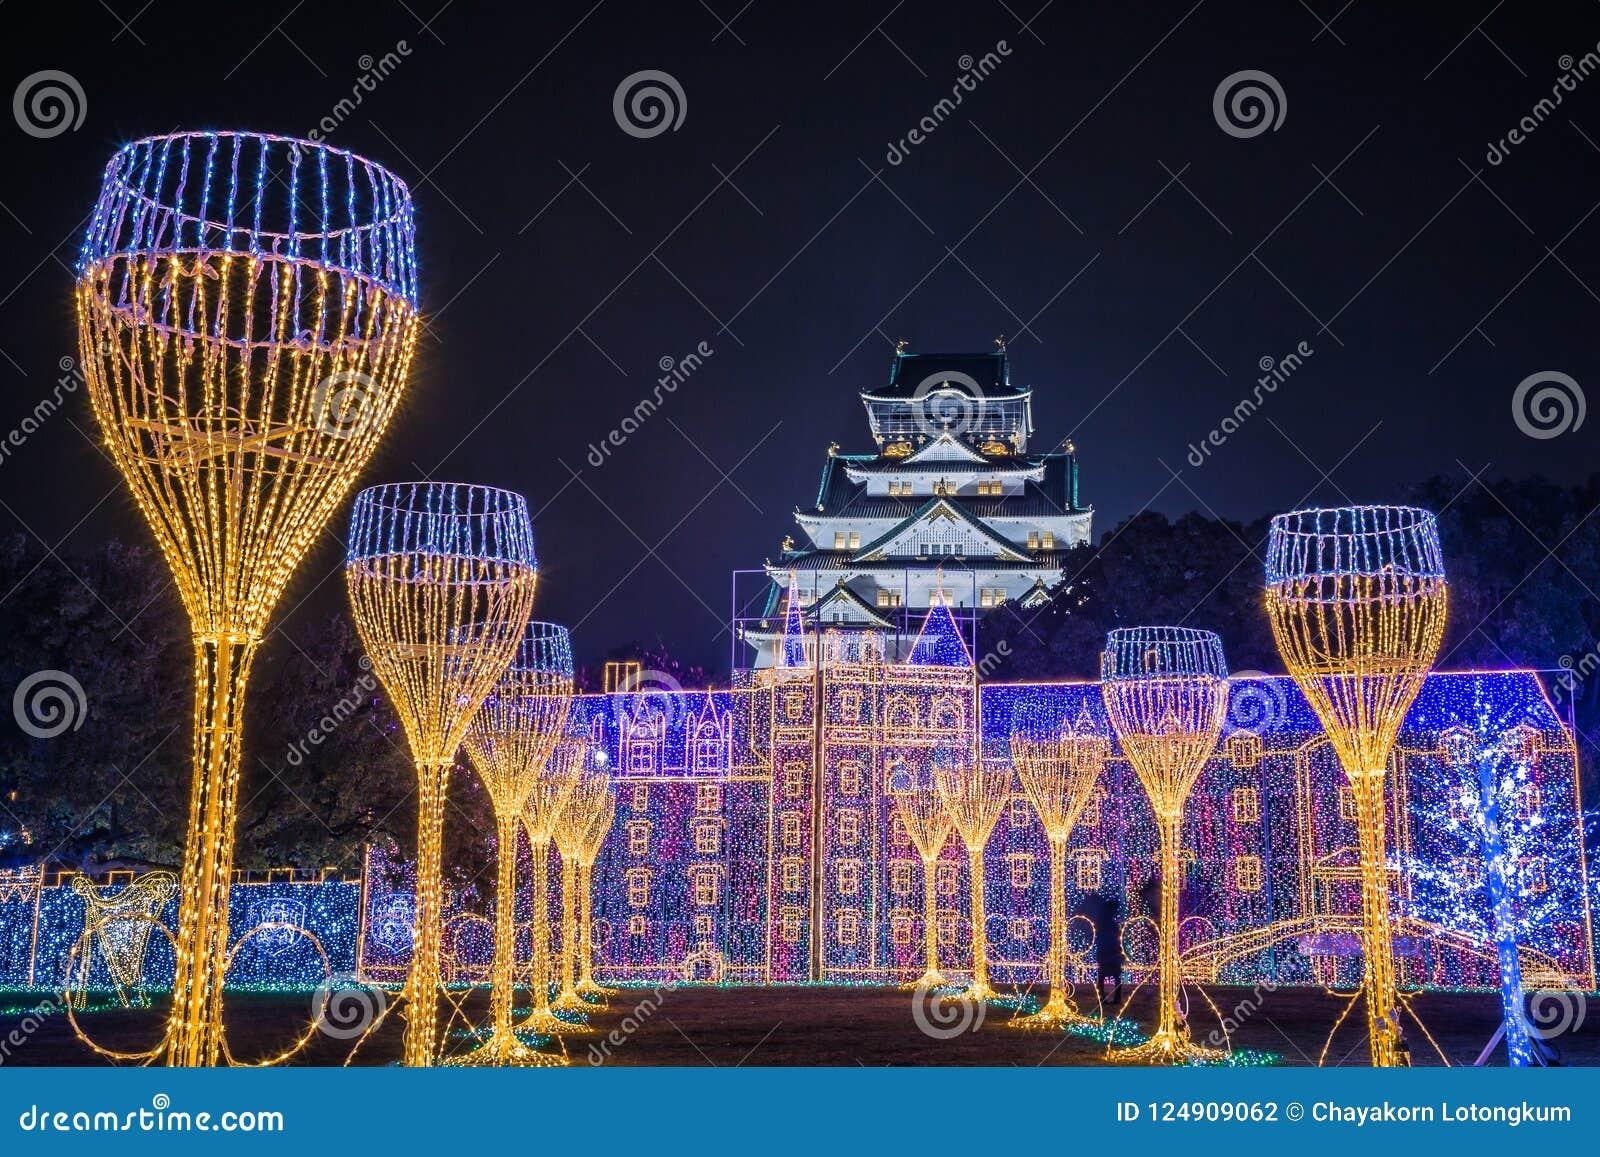 Osaka Castle night illumination the greatest light show in osaka